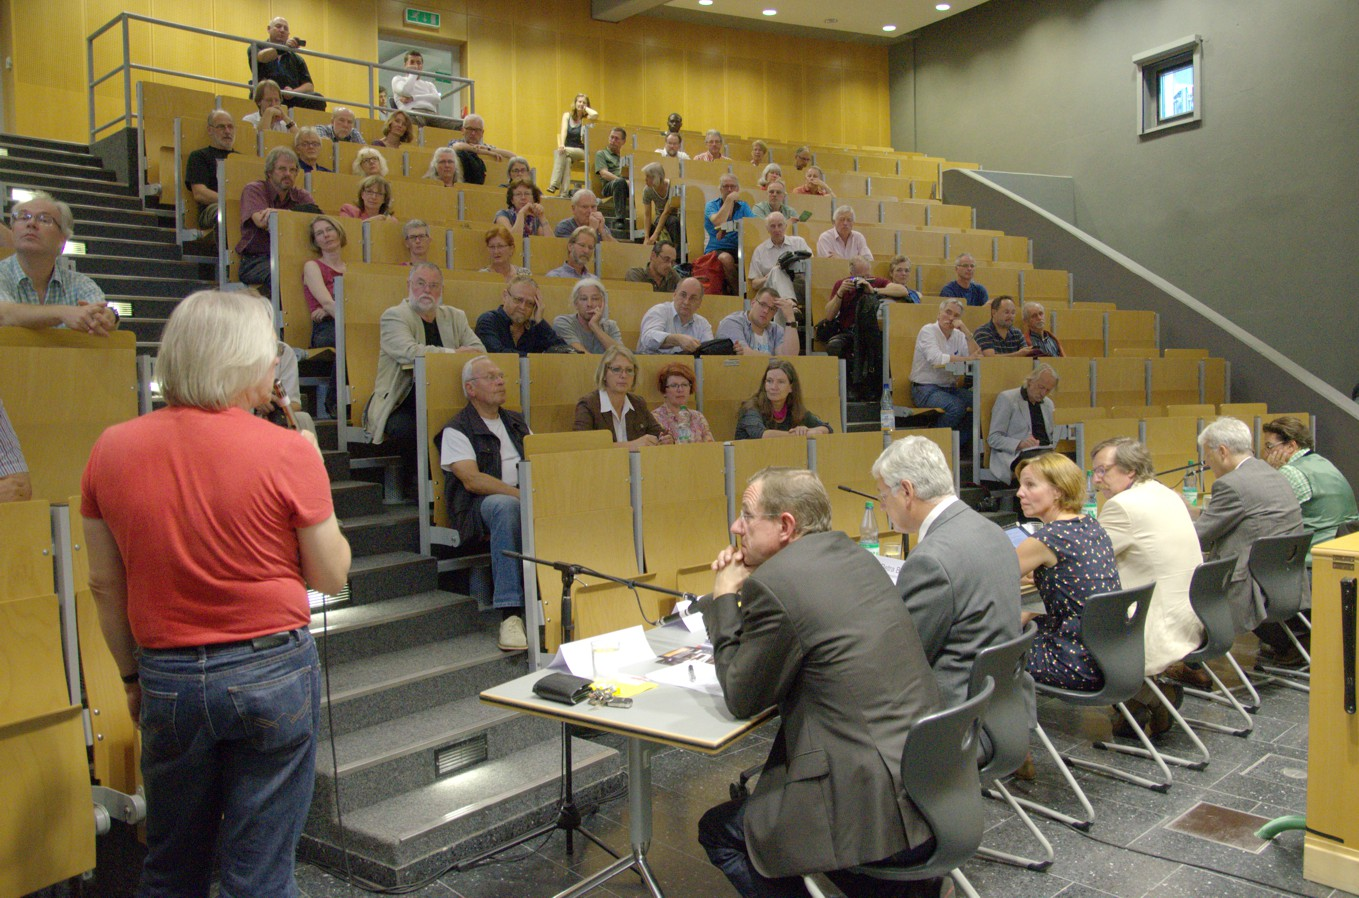 Begrüßung im Hörsaal der THM-Friedberg durch Klaus Kissel (Querstellen)